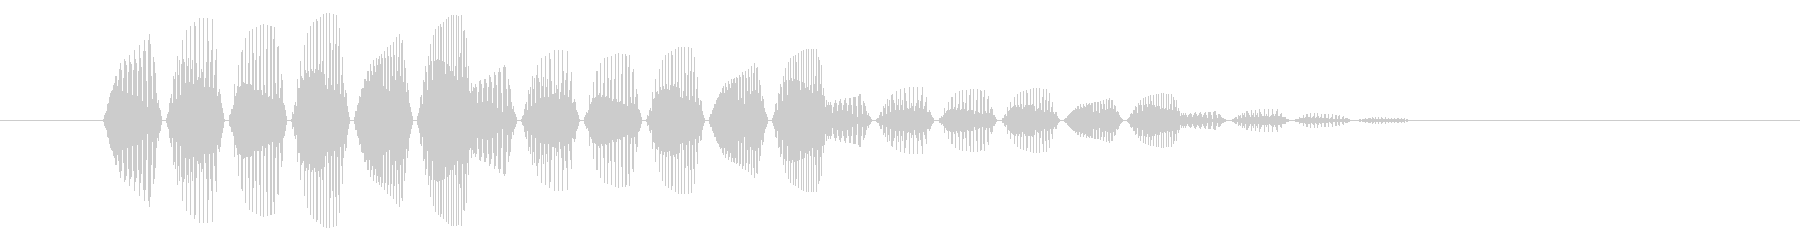 SNES 格闘05-11(選択)の未再生の波形